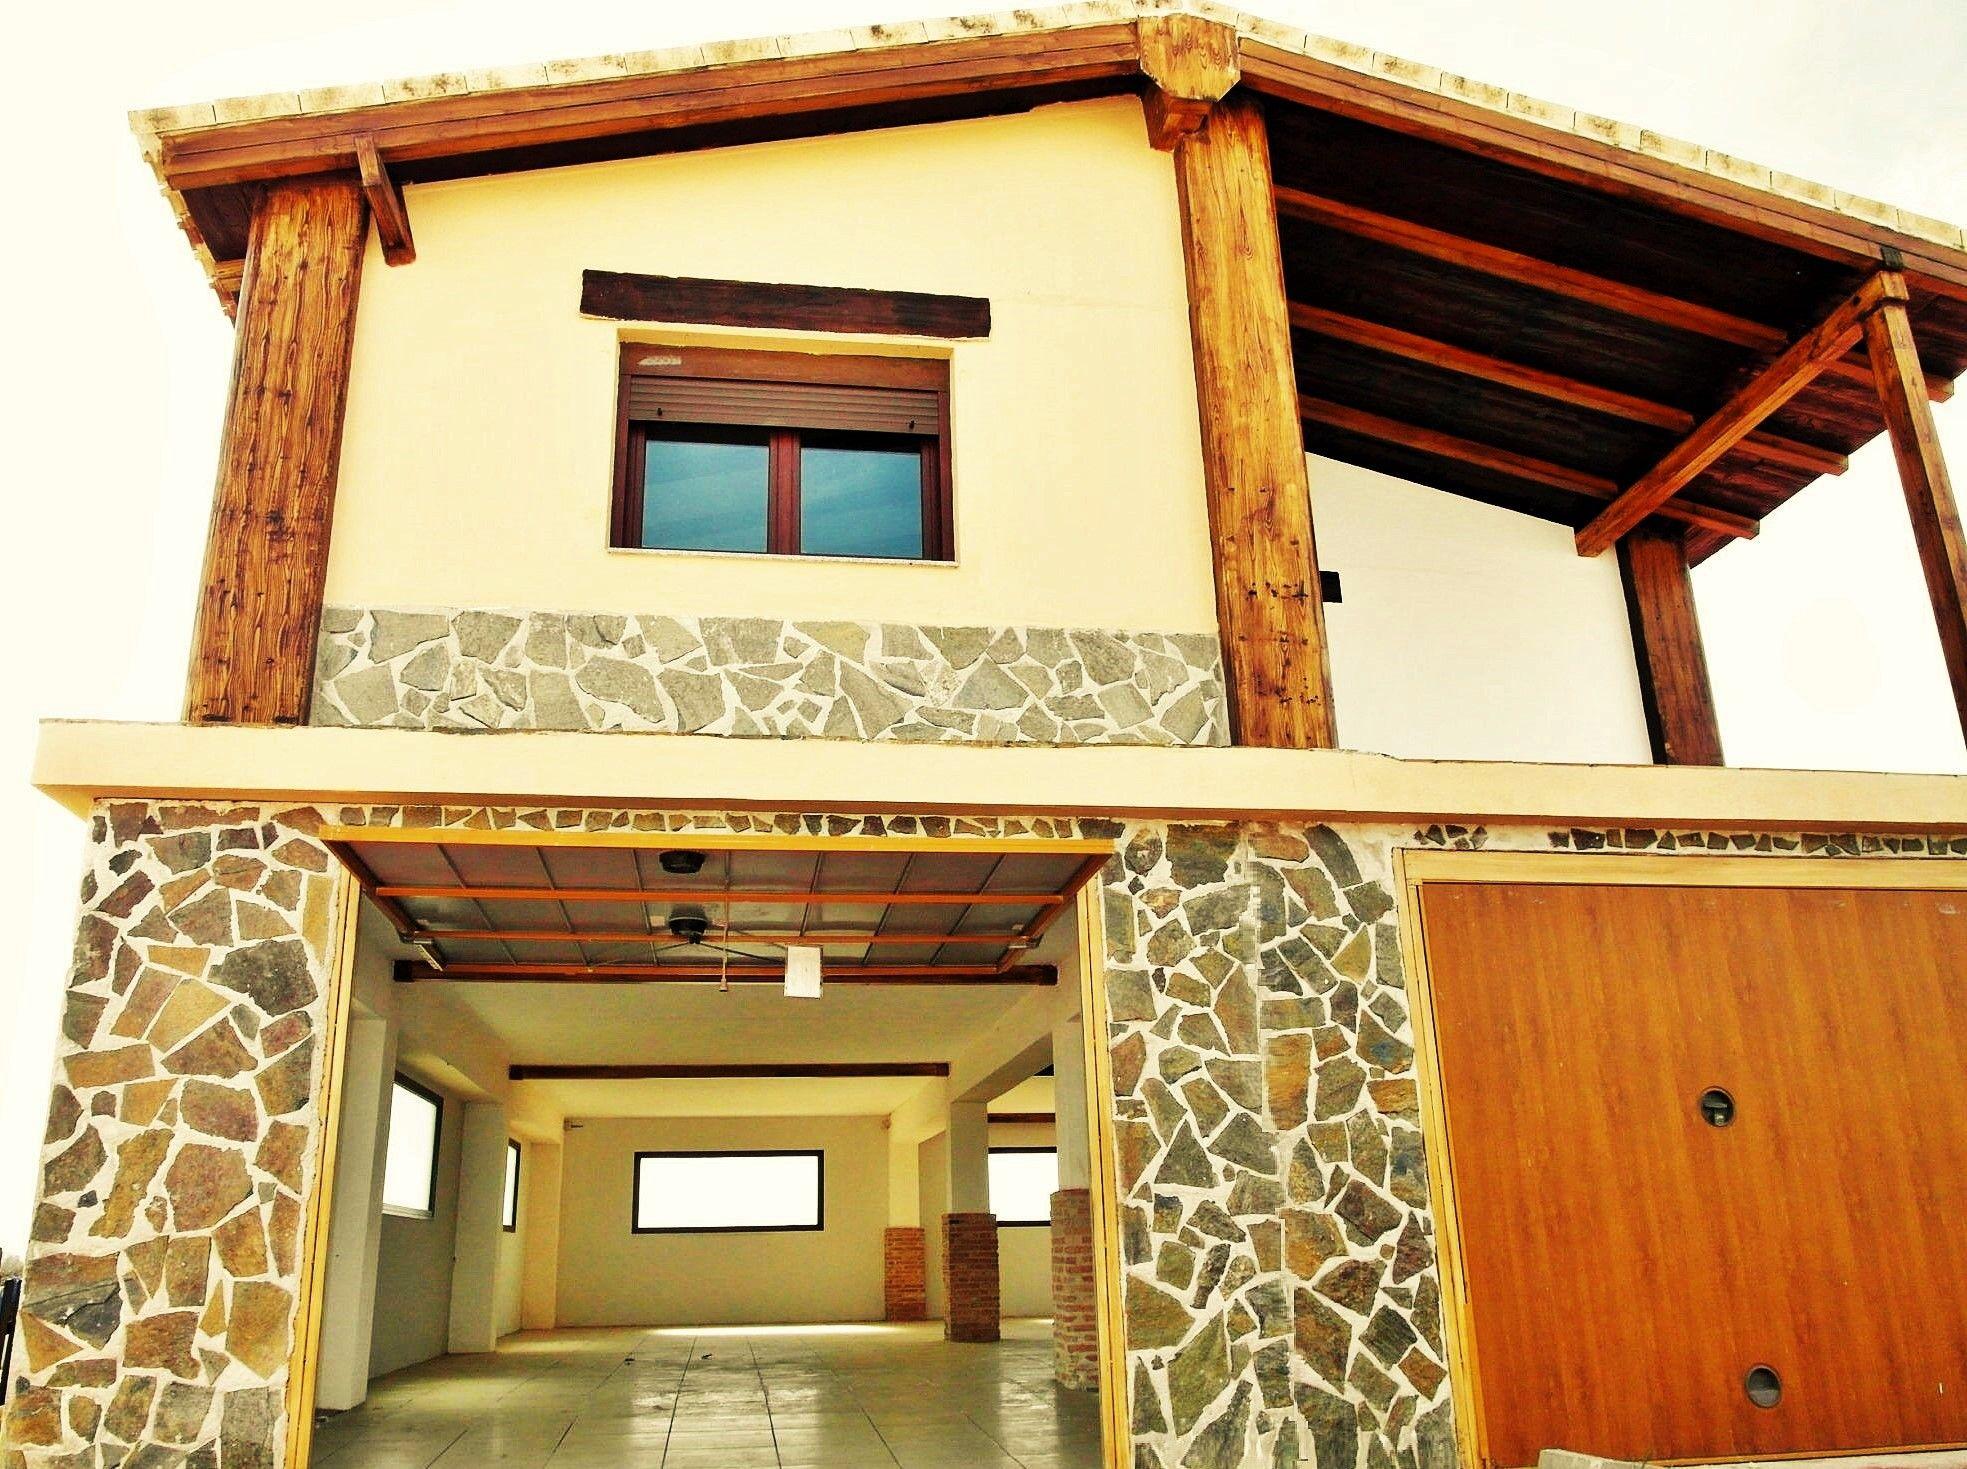 Casa de campo prefabricada con sotano www for Casas de campo prefabricadas